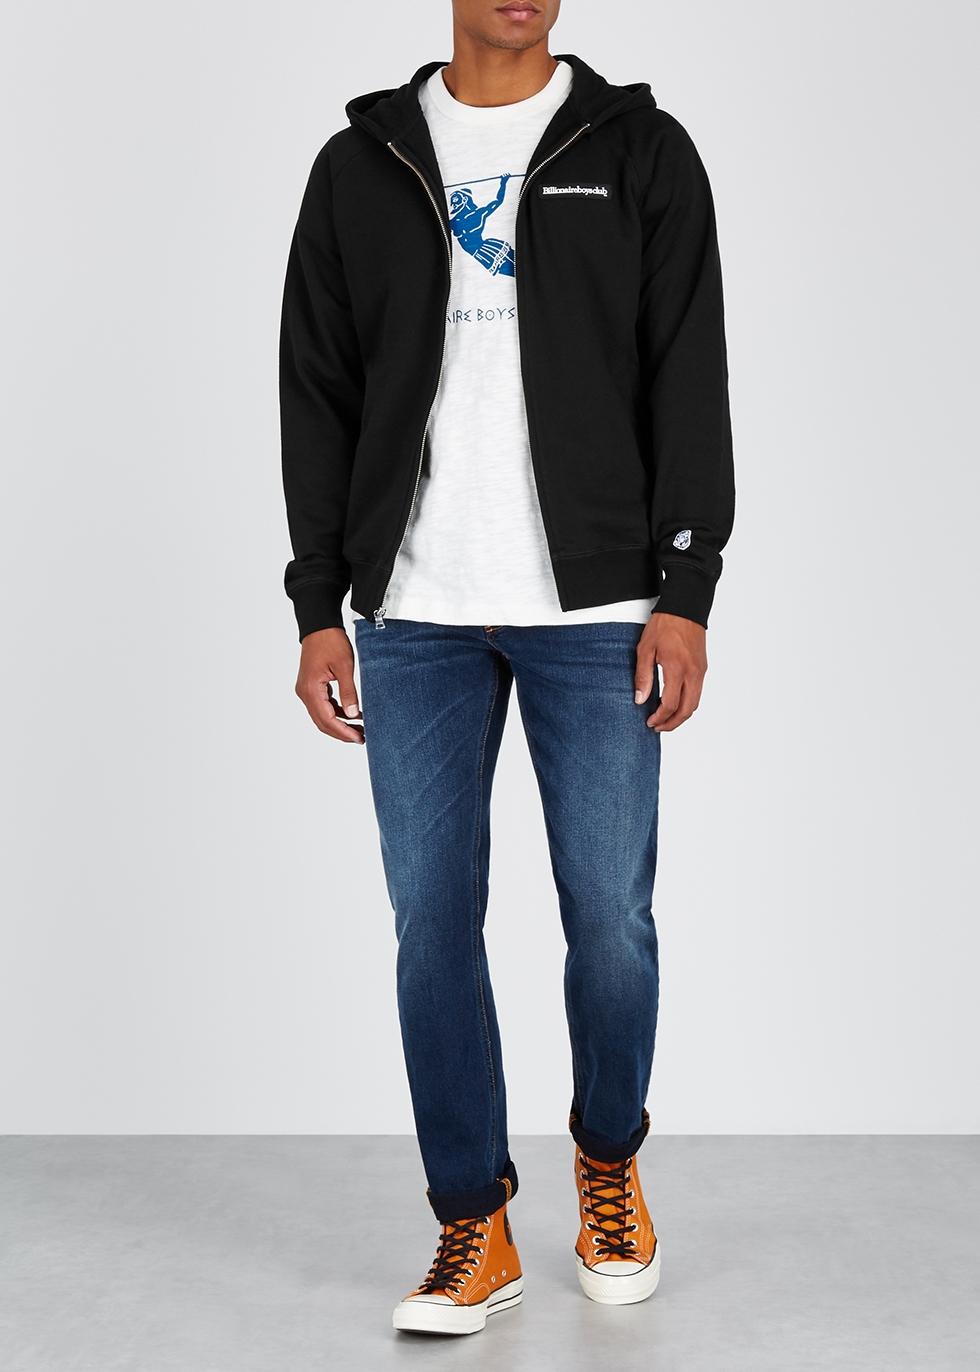 Black cotton-jersey sweatshirt - Billionaire Boys Club